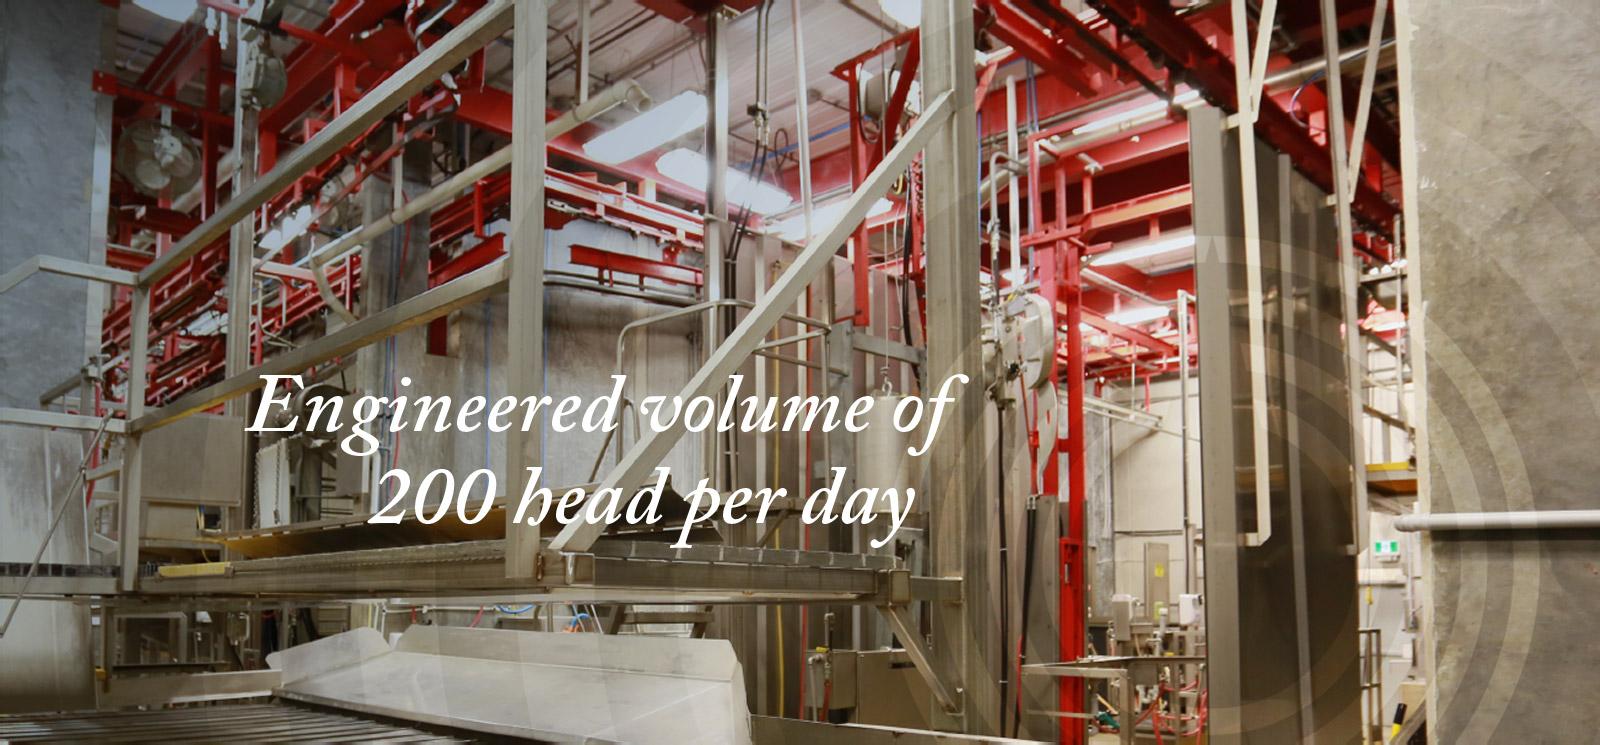 Engineered volume of 200 head per day